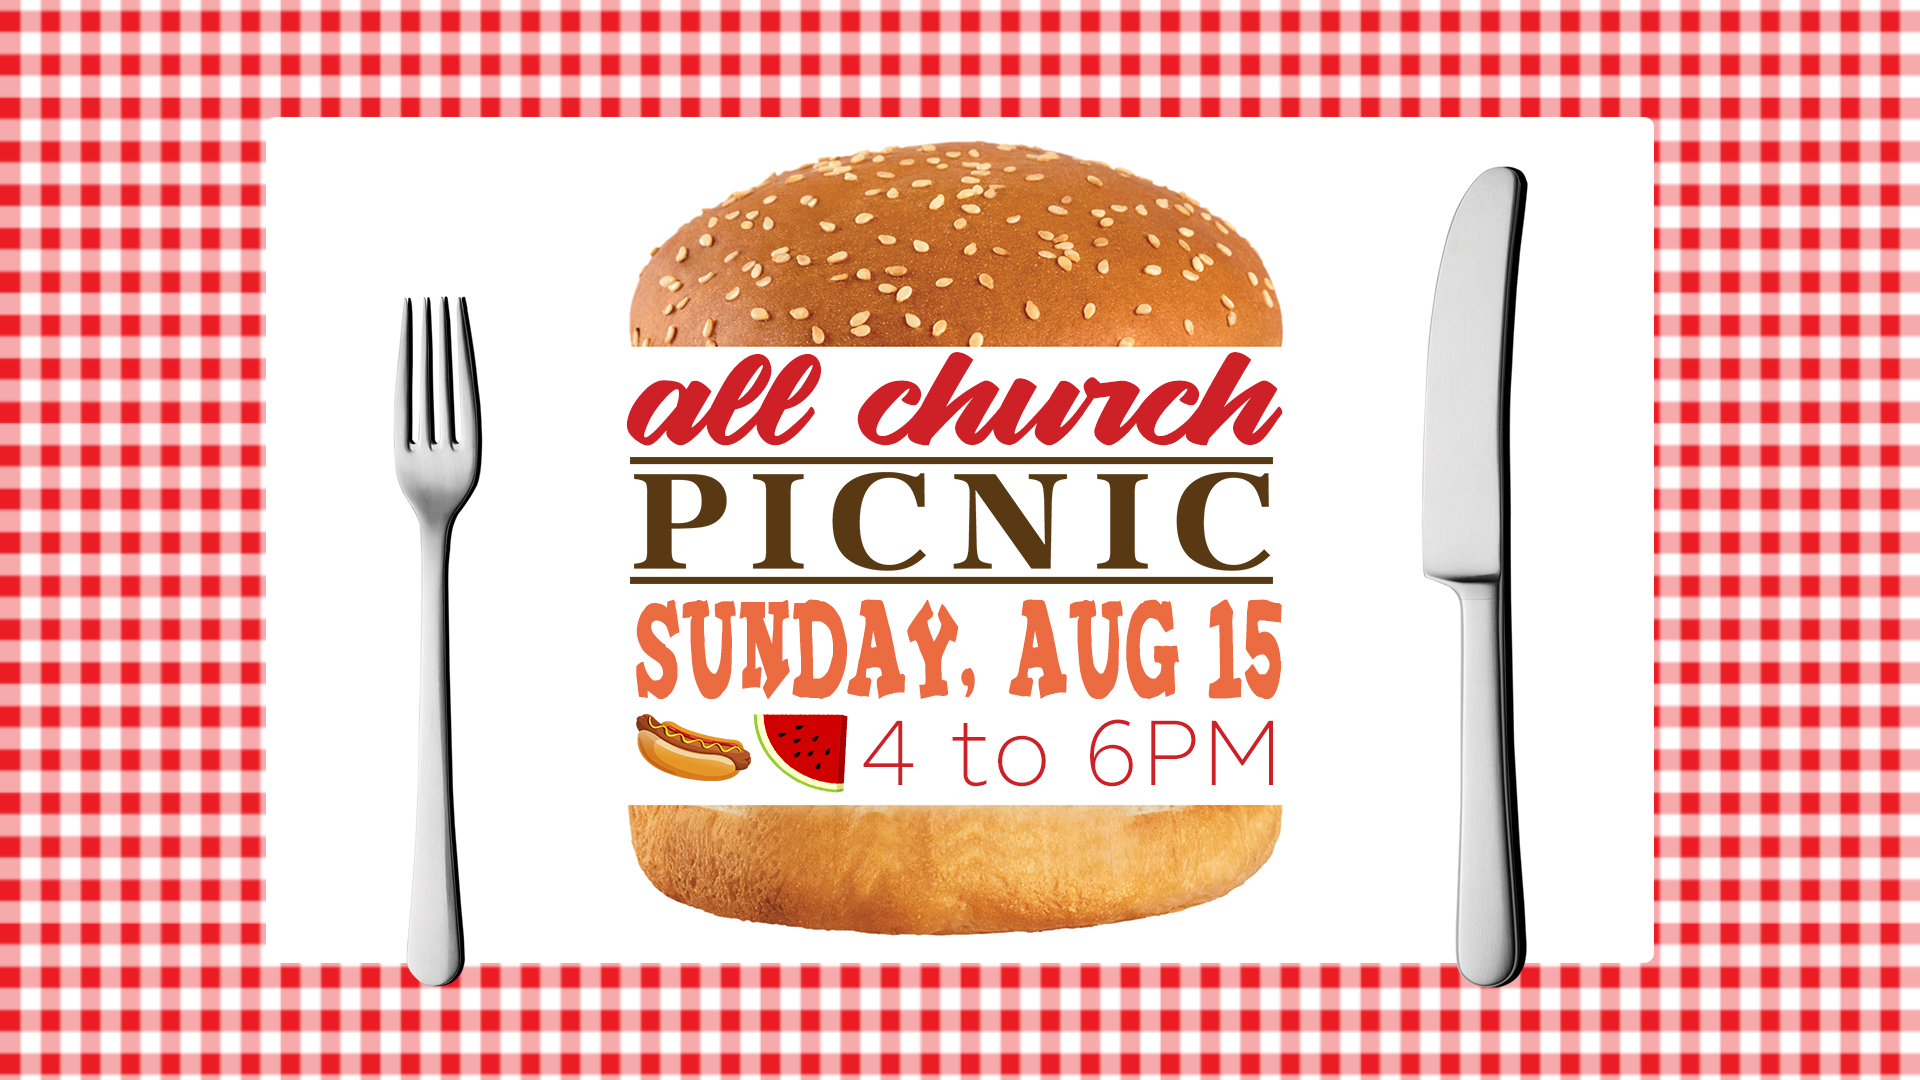 +All Church Picnic_web banner